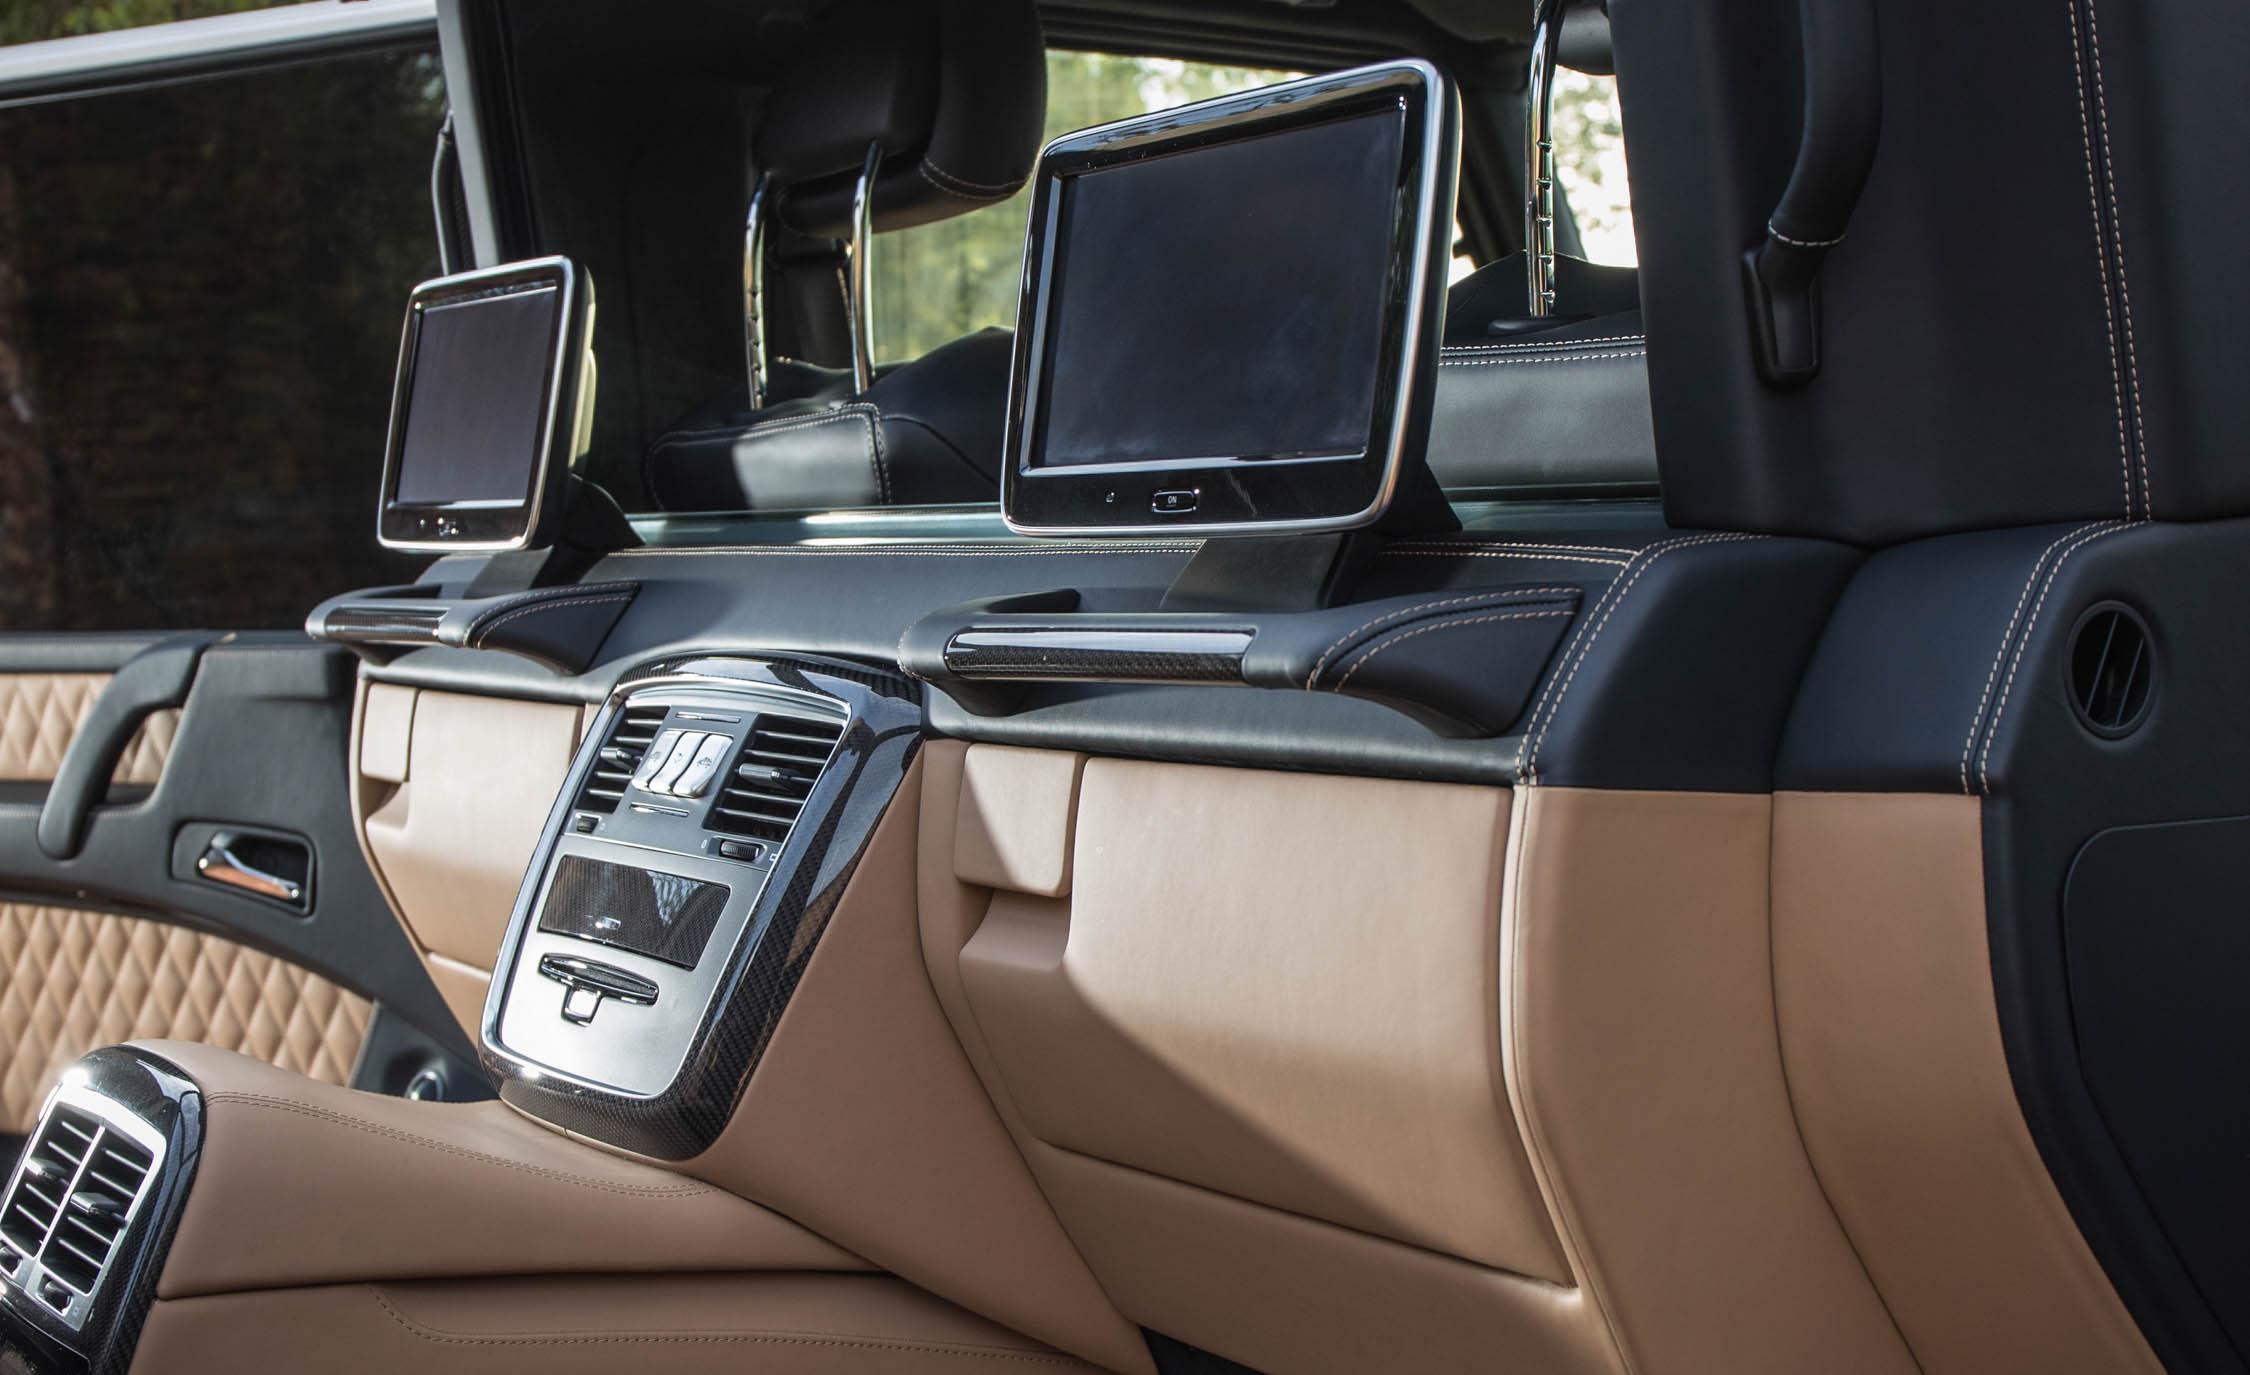 2018 Mercedes Maybach G650 Landaulet Interior Rear Headunit Screen (Photo 32 of 52)